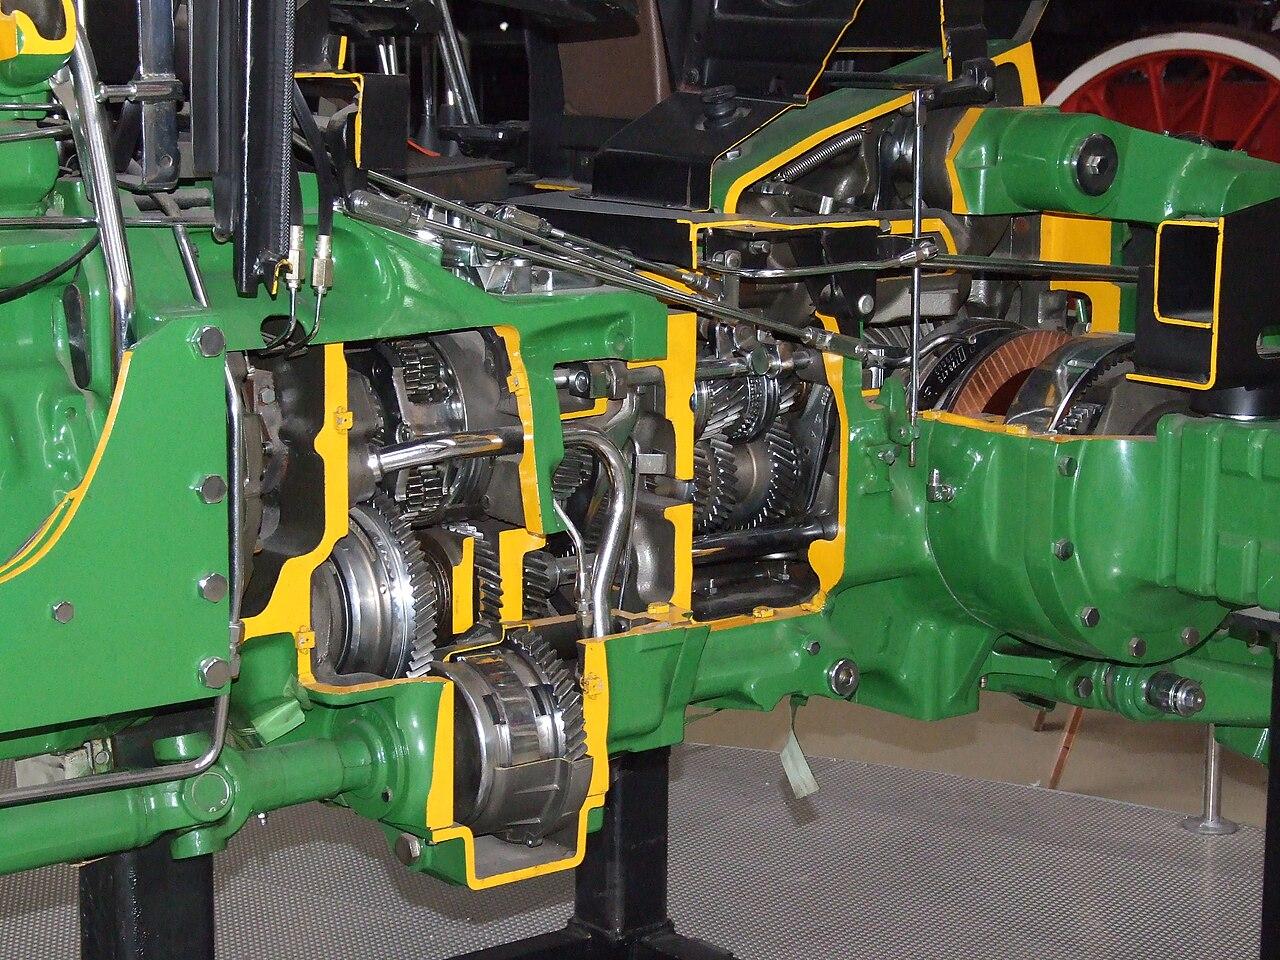 John Deere 6420 Wiring Diagram File John Deere 3350 Tractor Cut Transmission Angle Jpg